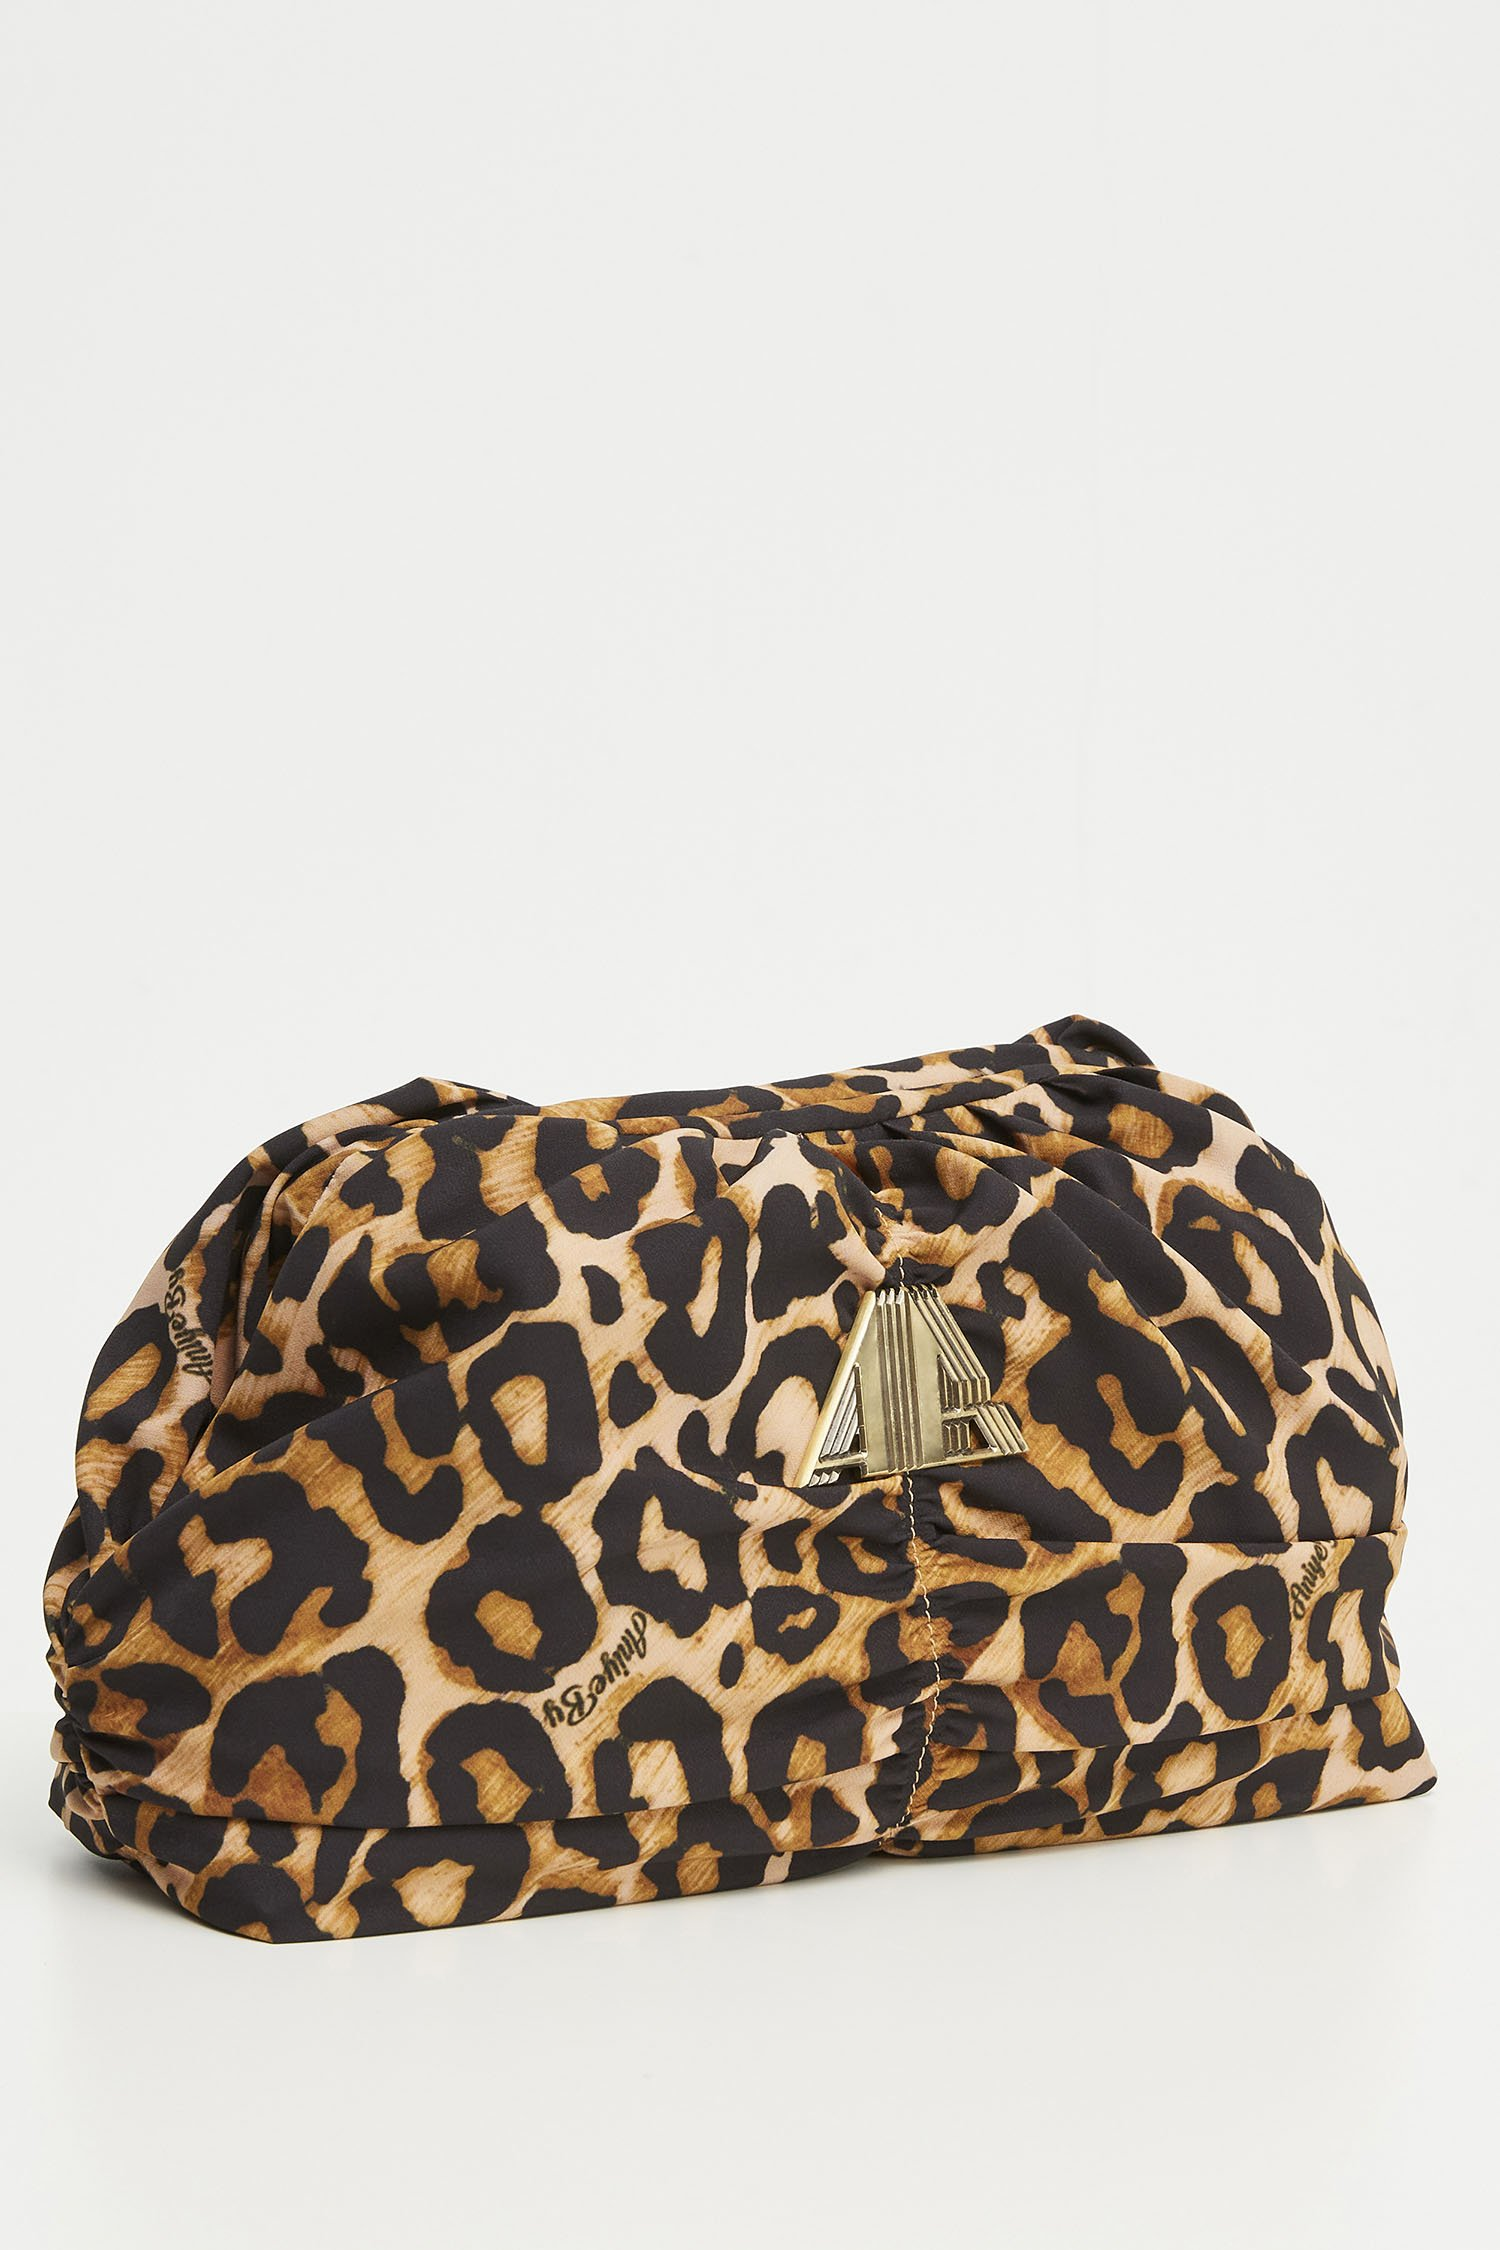 Pochette Lotty bag maku Aniye By